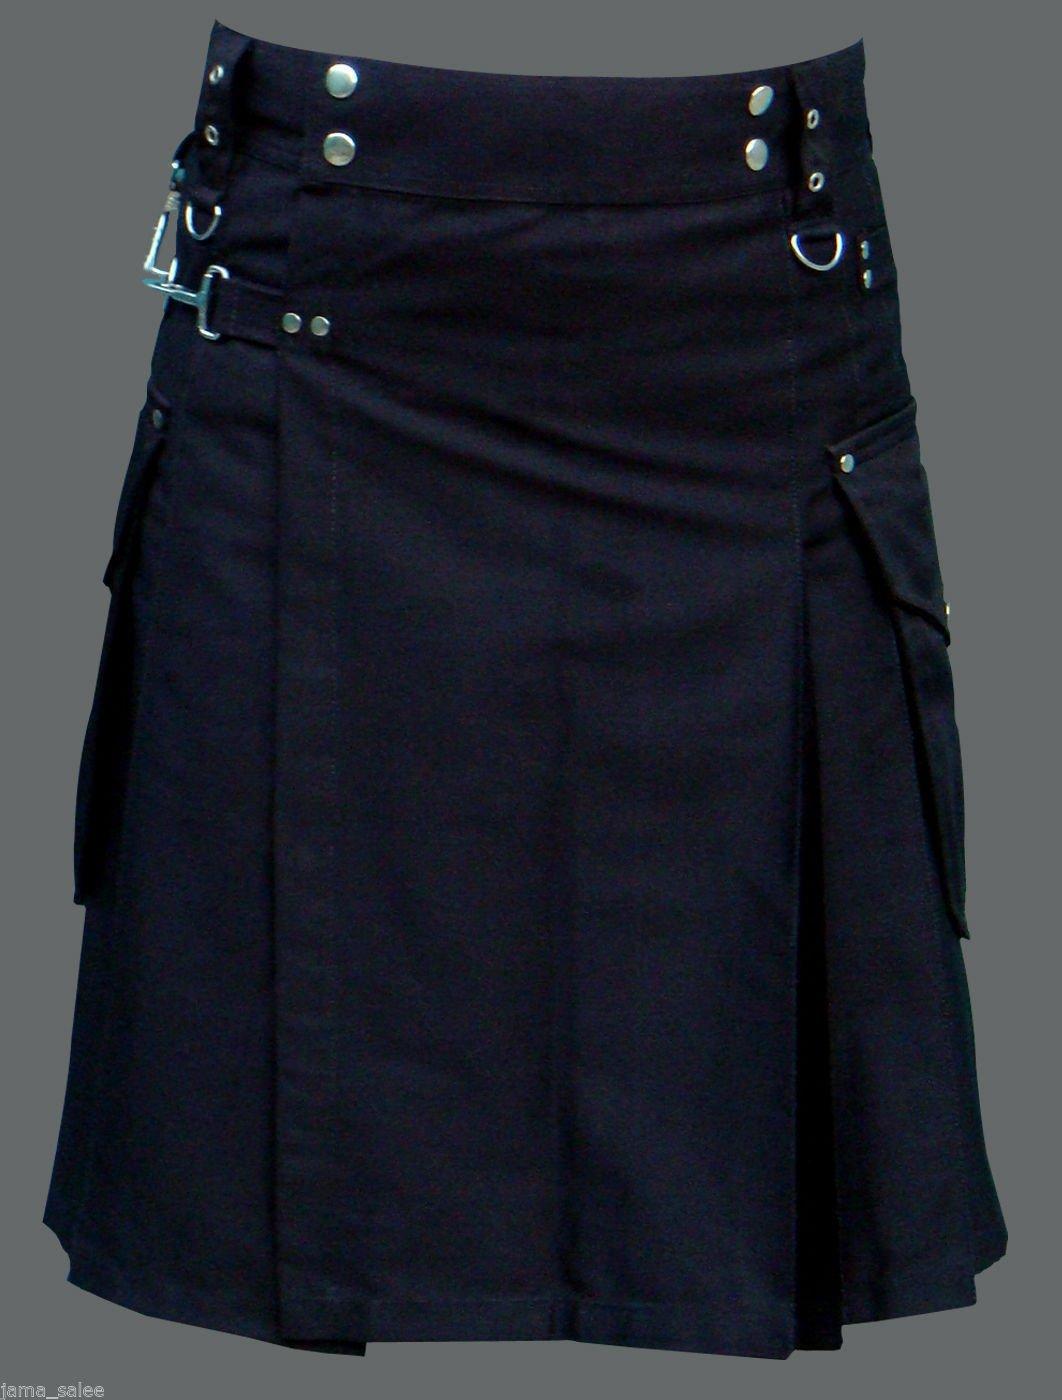 Men 52 Waist Handmade Black Deluxe Utility Kilt 100% Cotton With Cargo Pockets